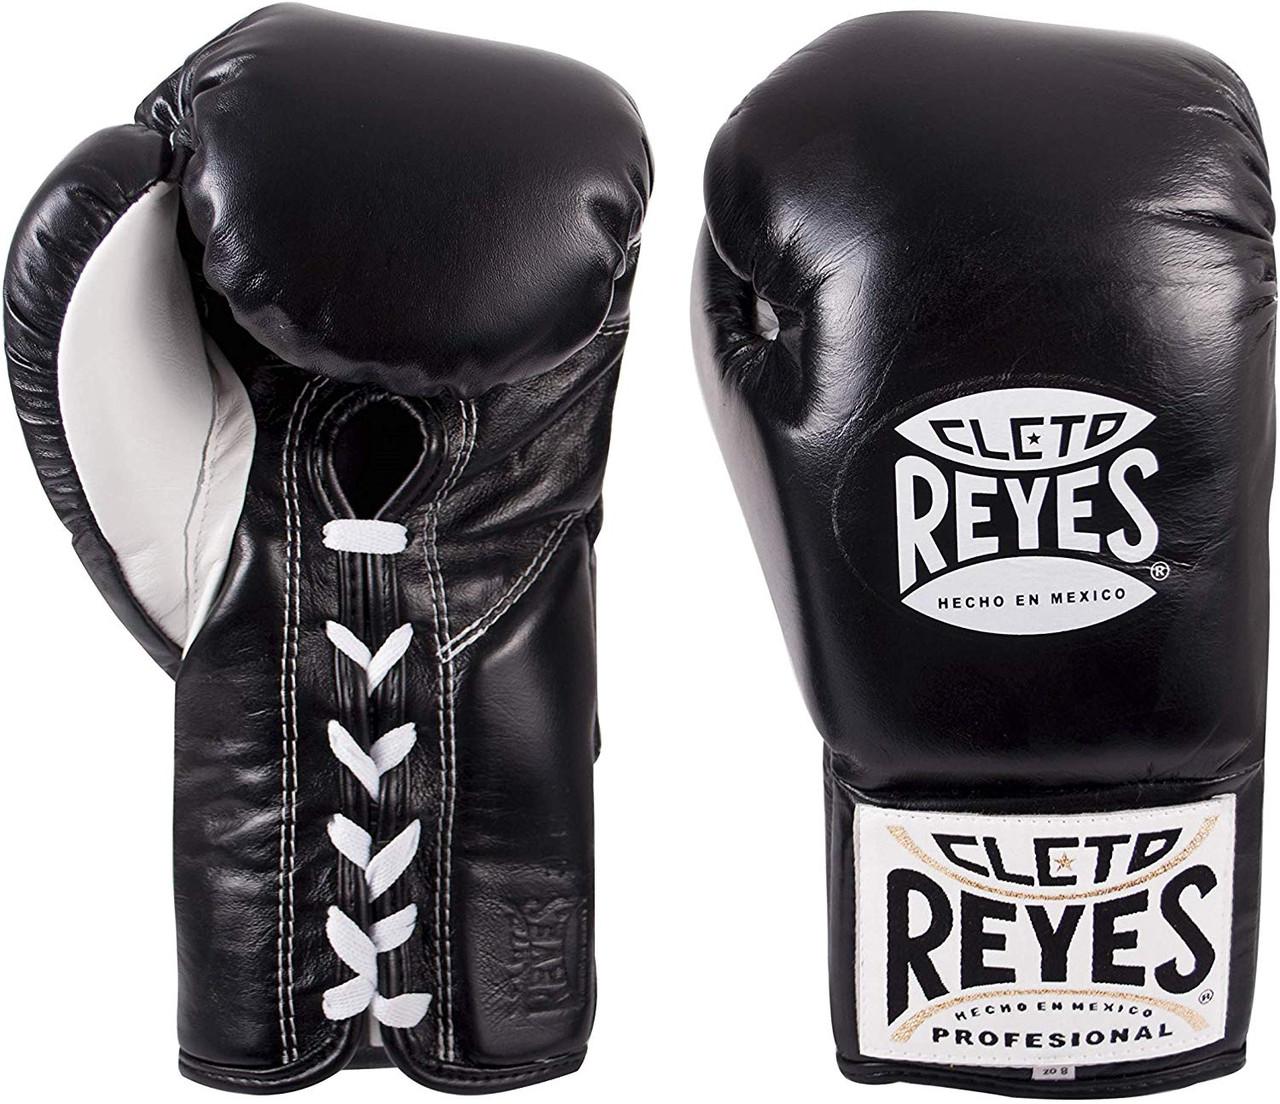 Cleto Reyes Pro Fight Gloves Black